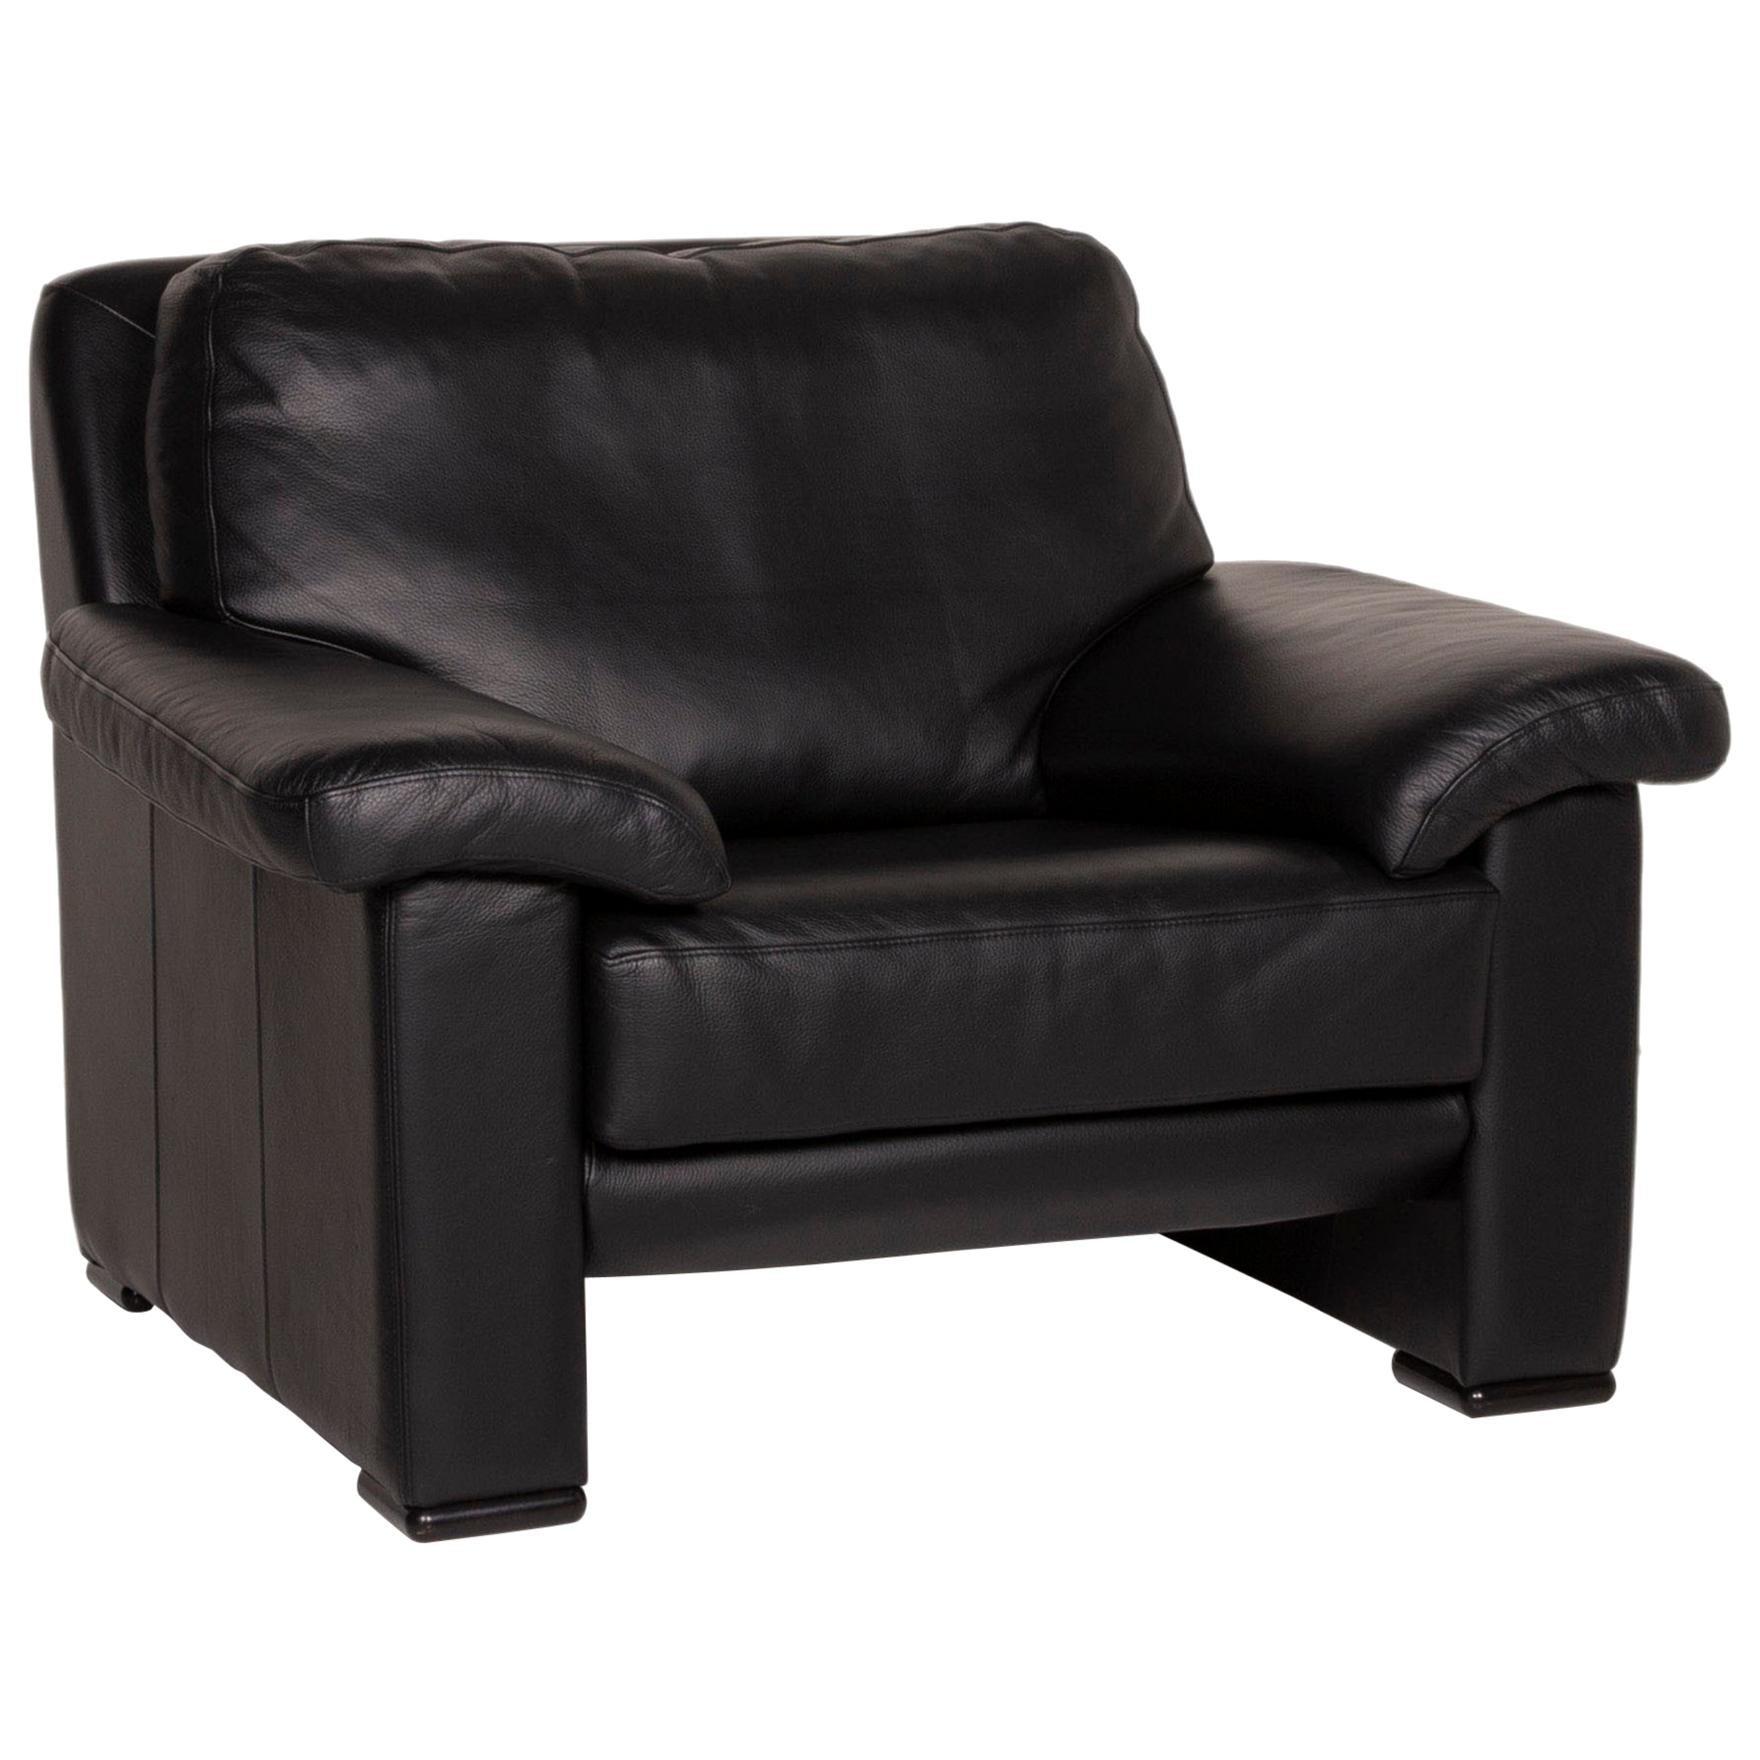 Willi Schillig Leather Armchair Black